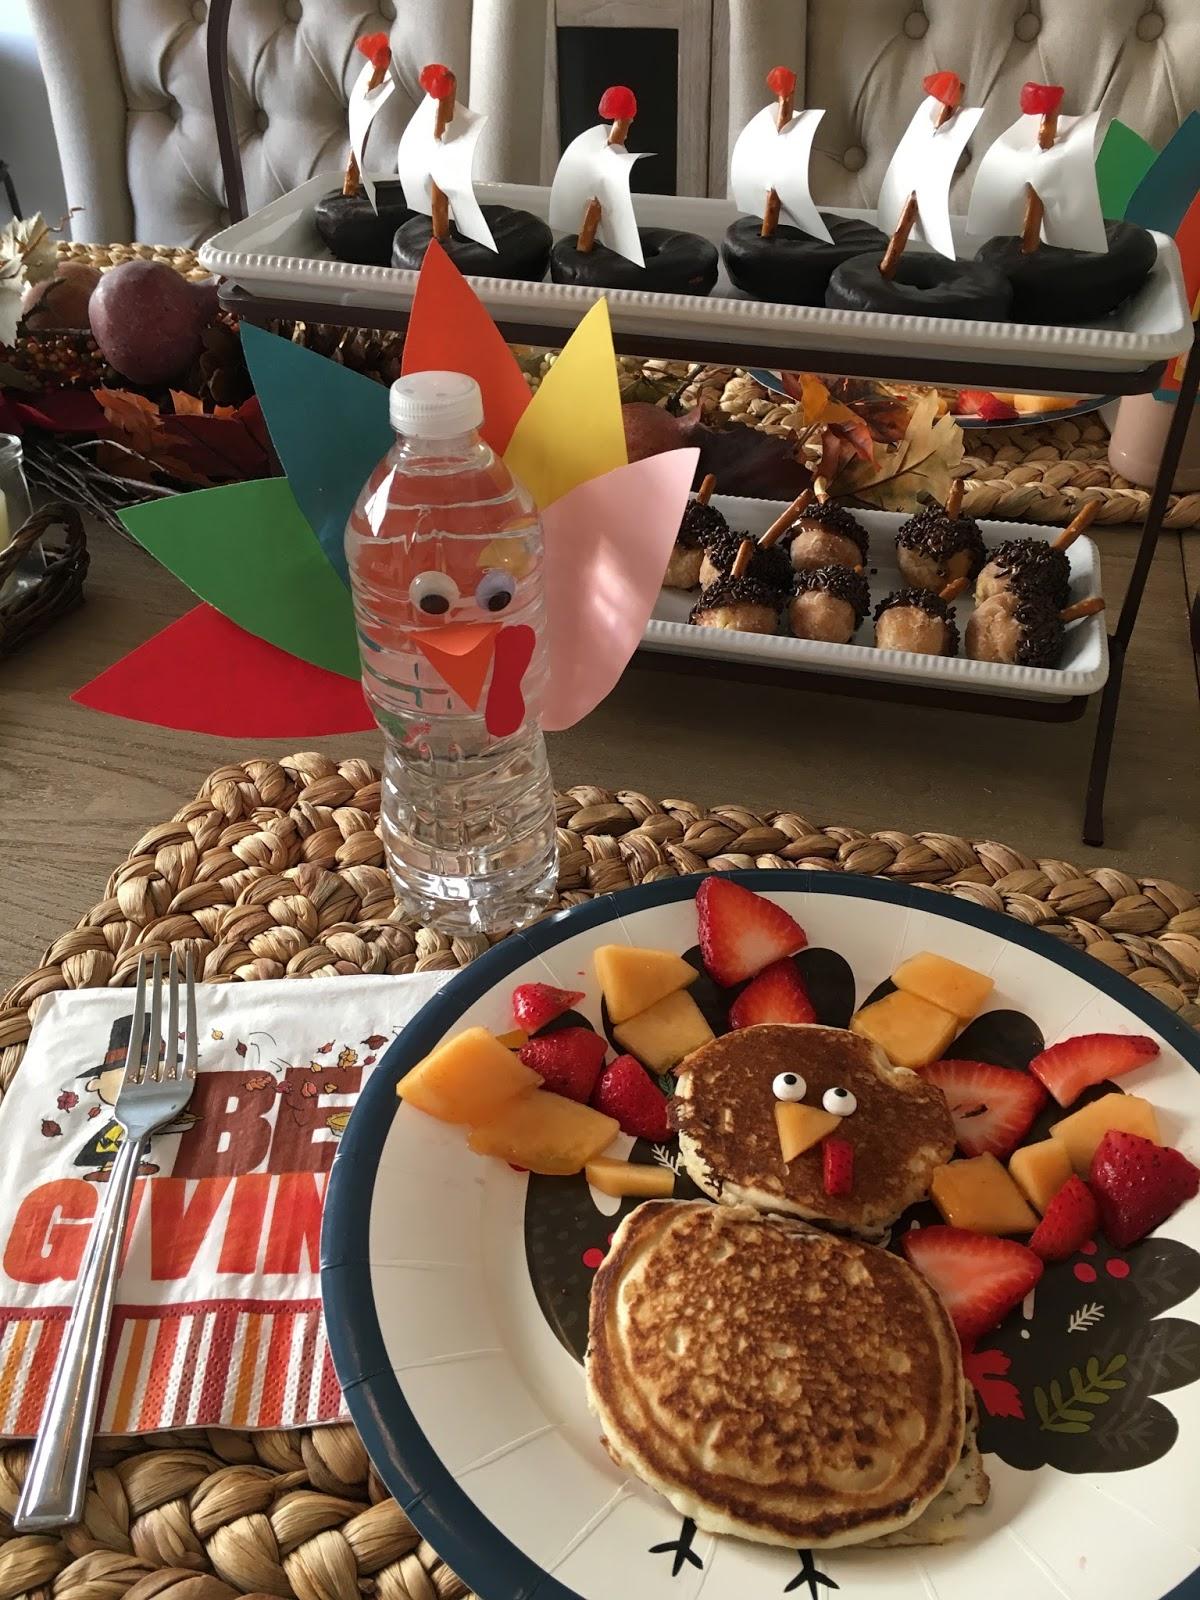 Kinder Garden: Kindergarten Smiles: Thanksgiving Centers (Parent Activity